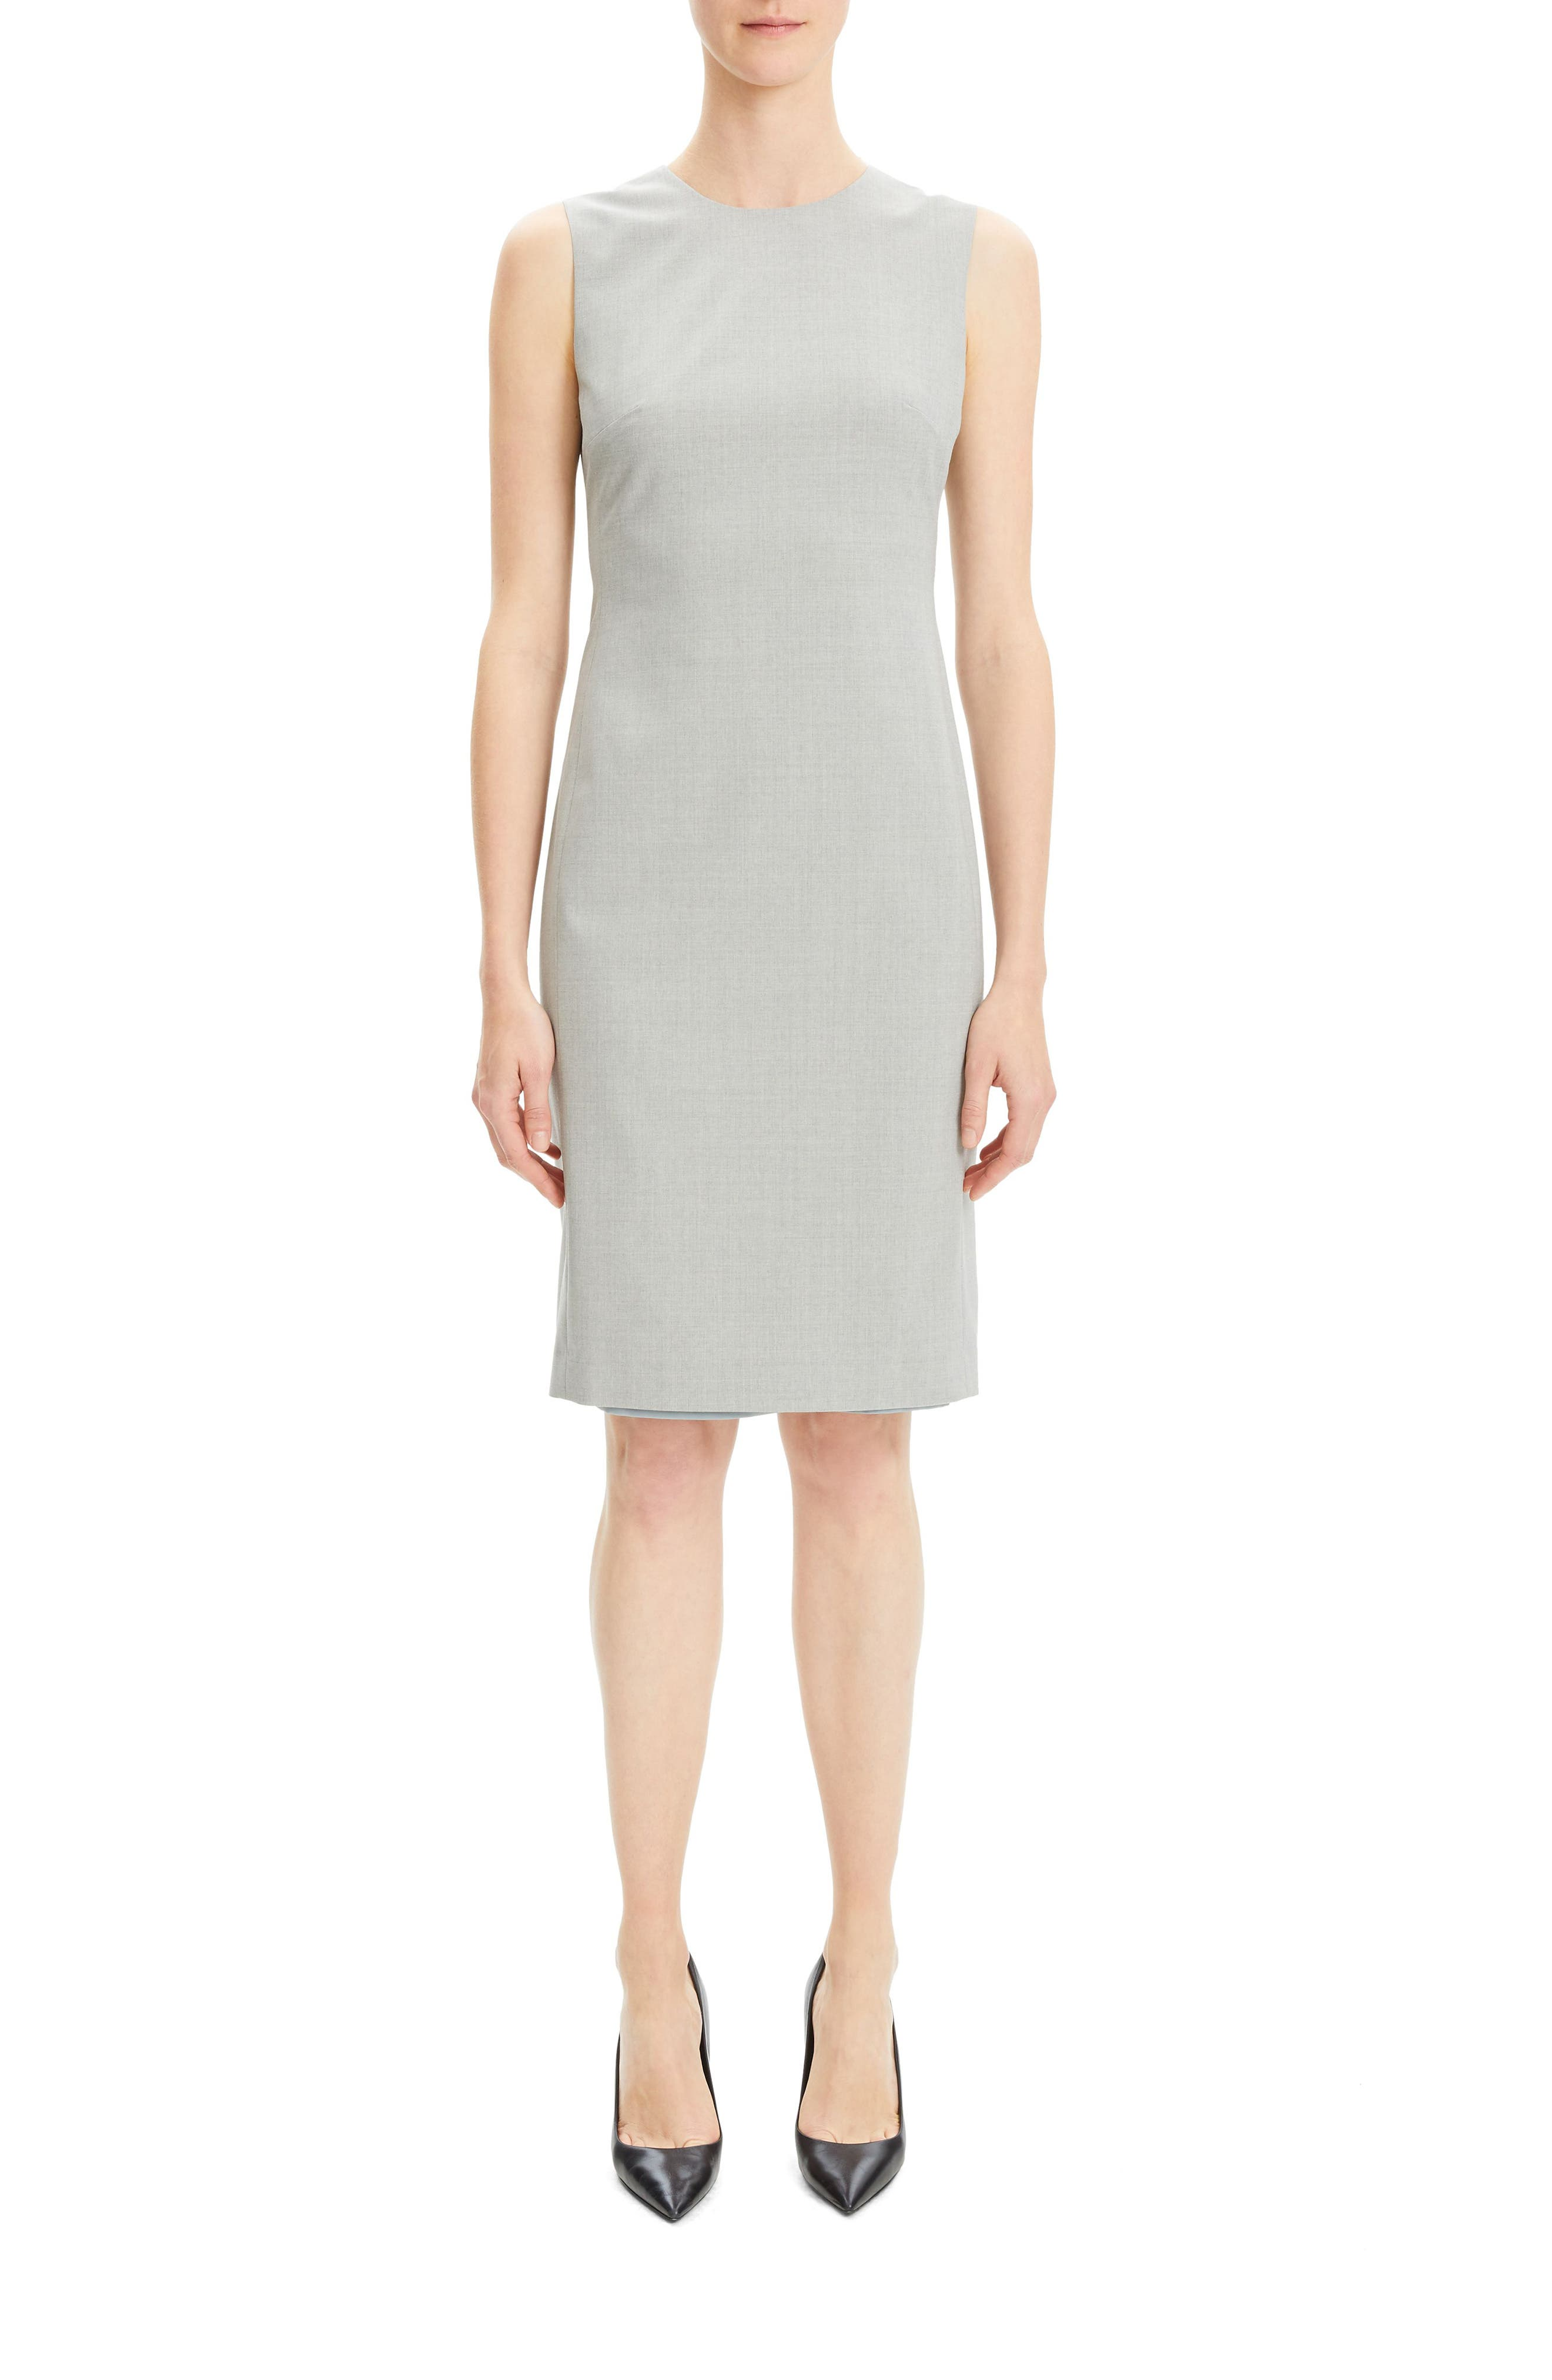 THEORY,                             Eano Good Wool Sheath Dress,                             Alternate thumbnail 5, color,                             050